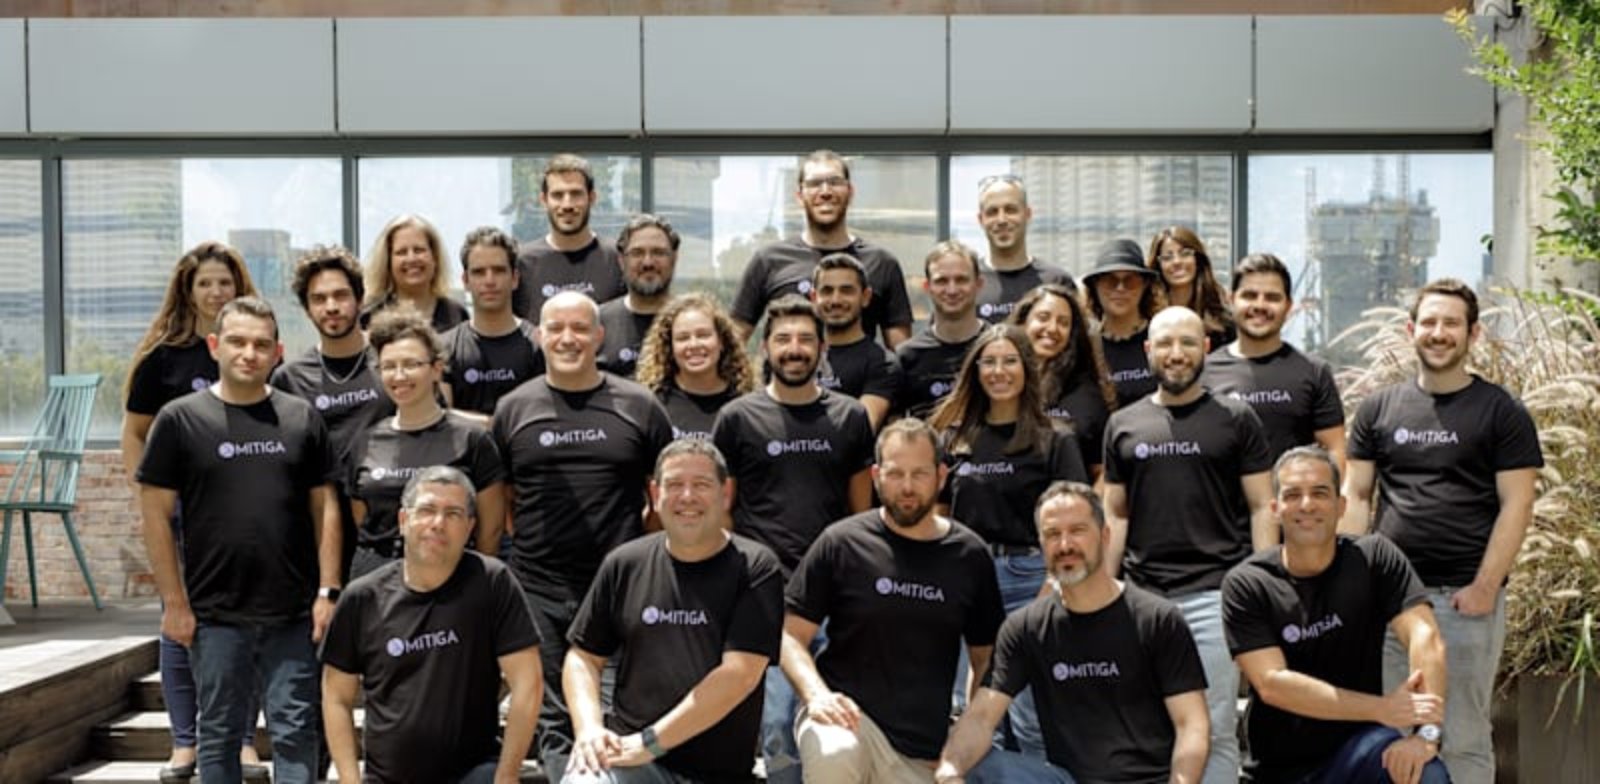 Mitiga's team Photo: Omer Hacohen